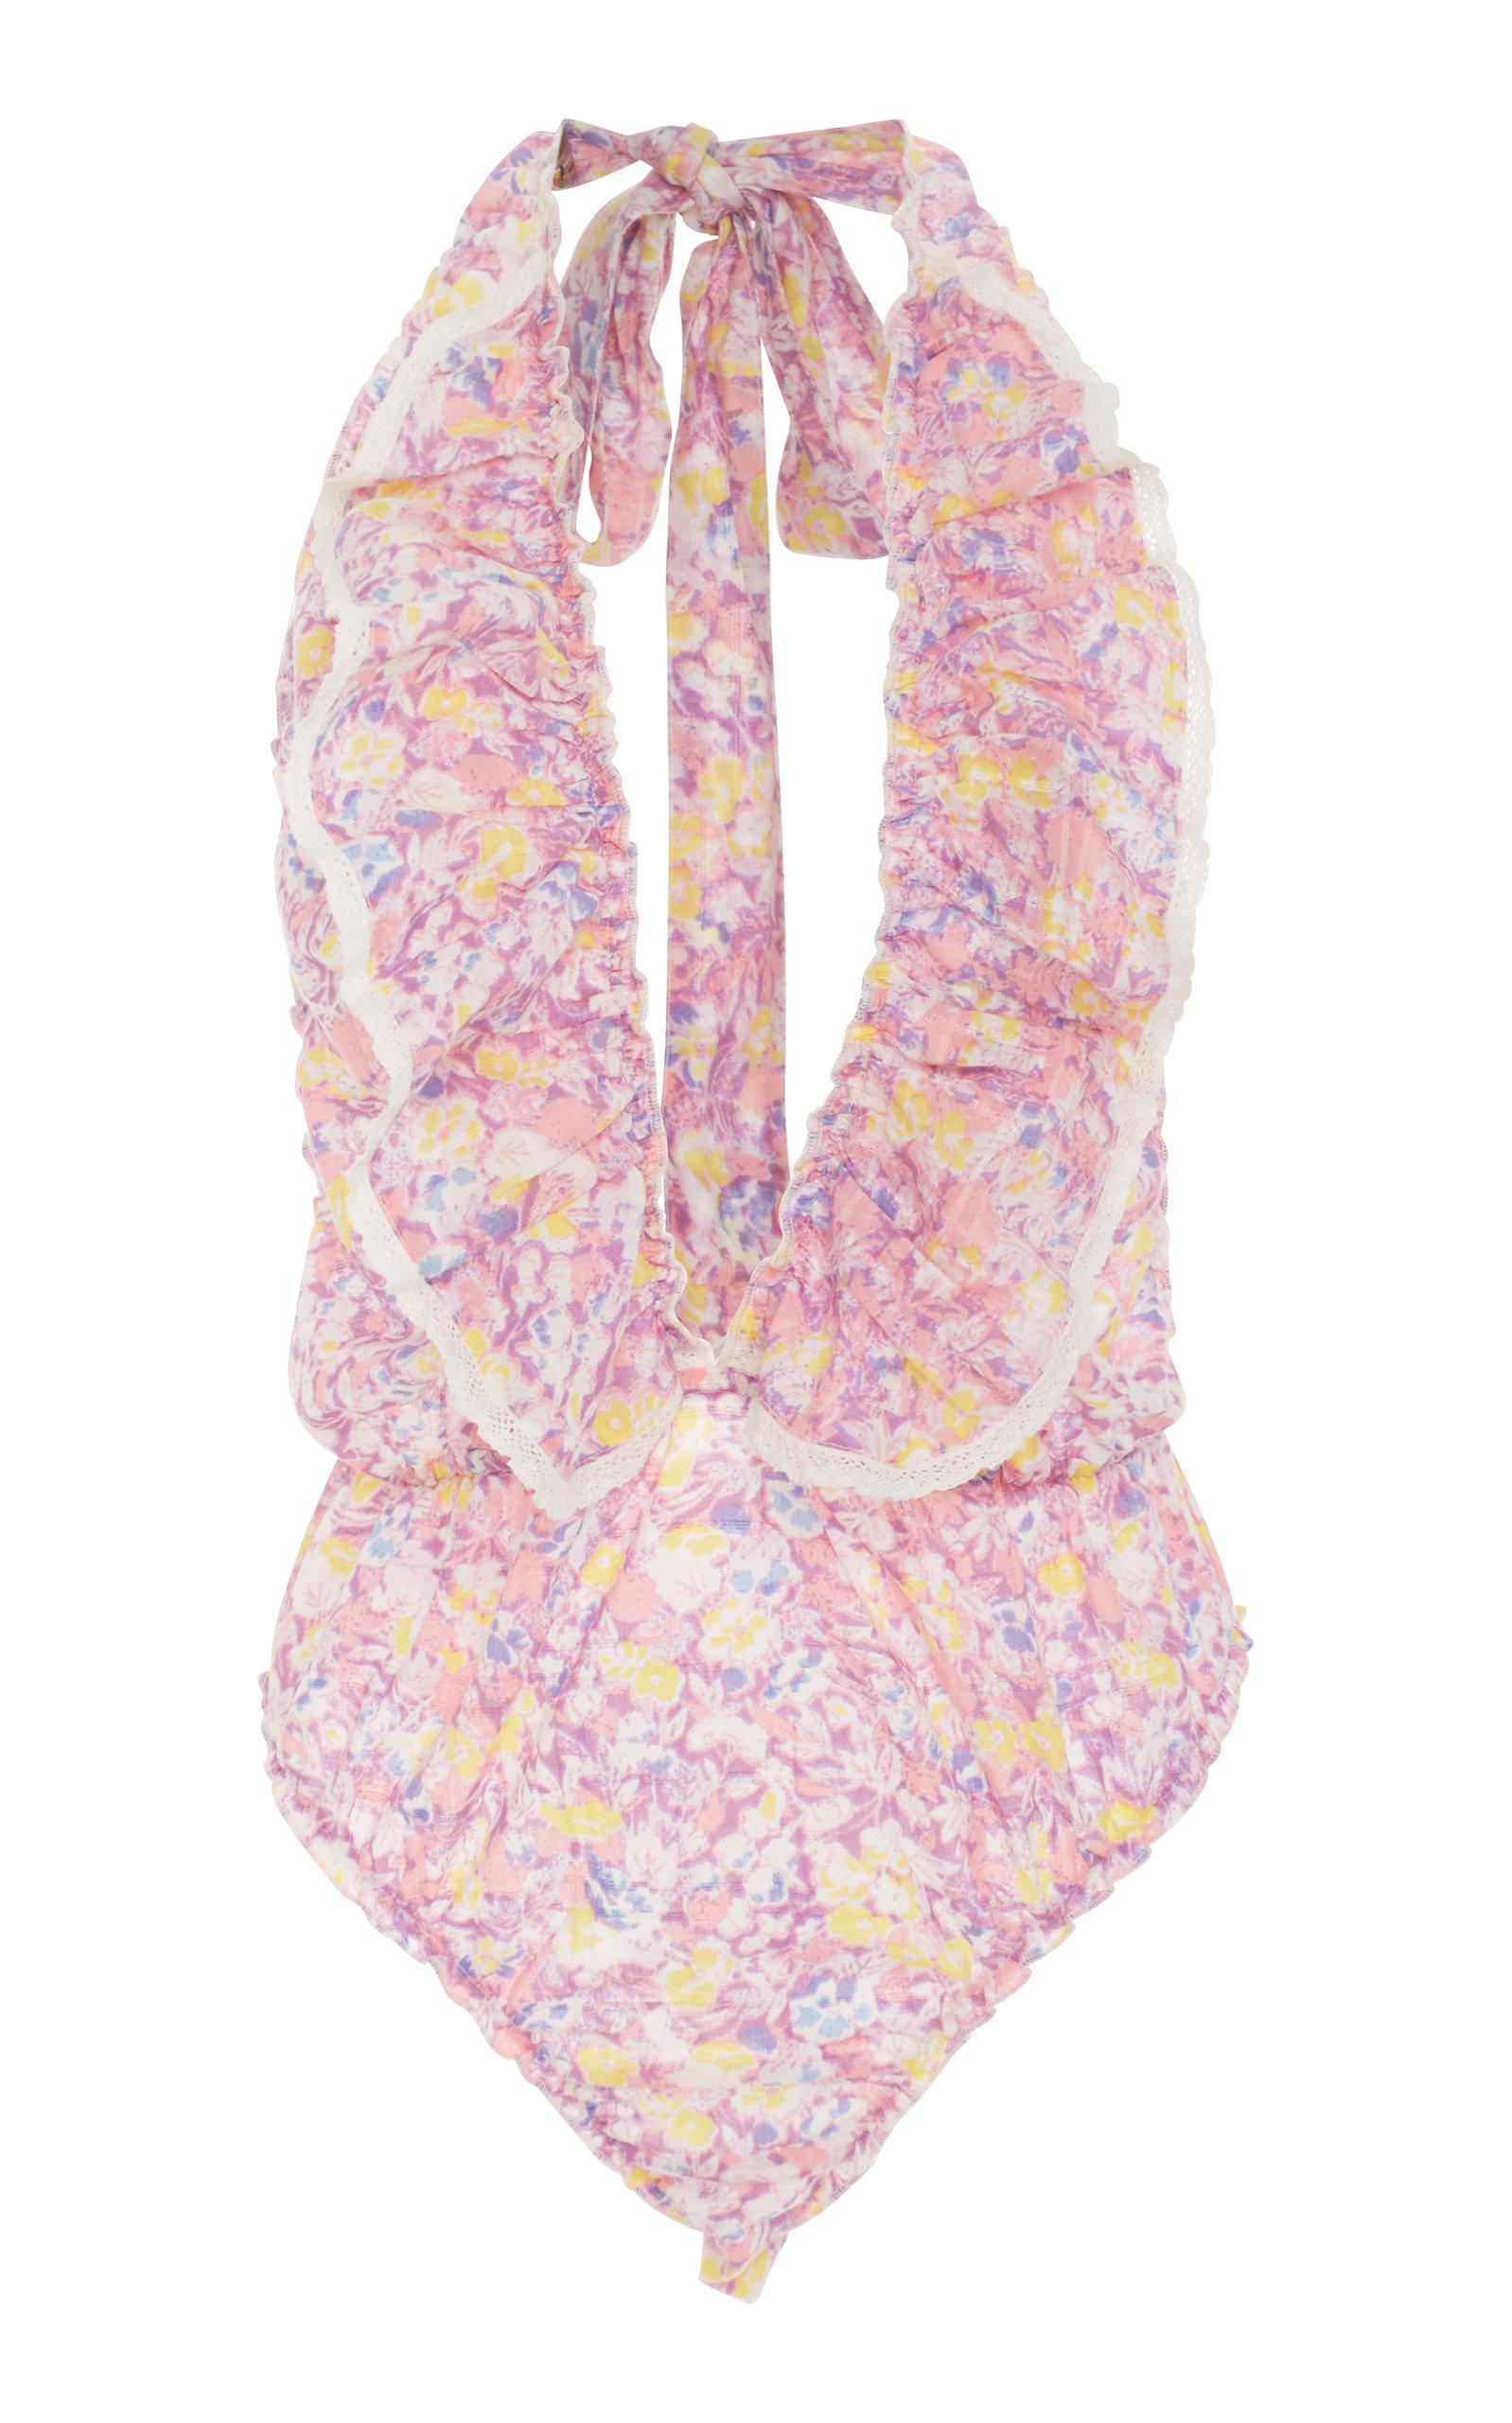 Peony Ruffle Body Suit LoveShackFancy Free Shipping Low Price hfxPB89Q